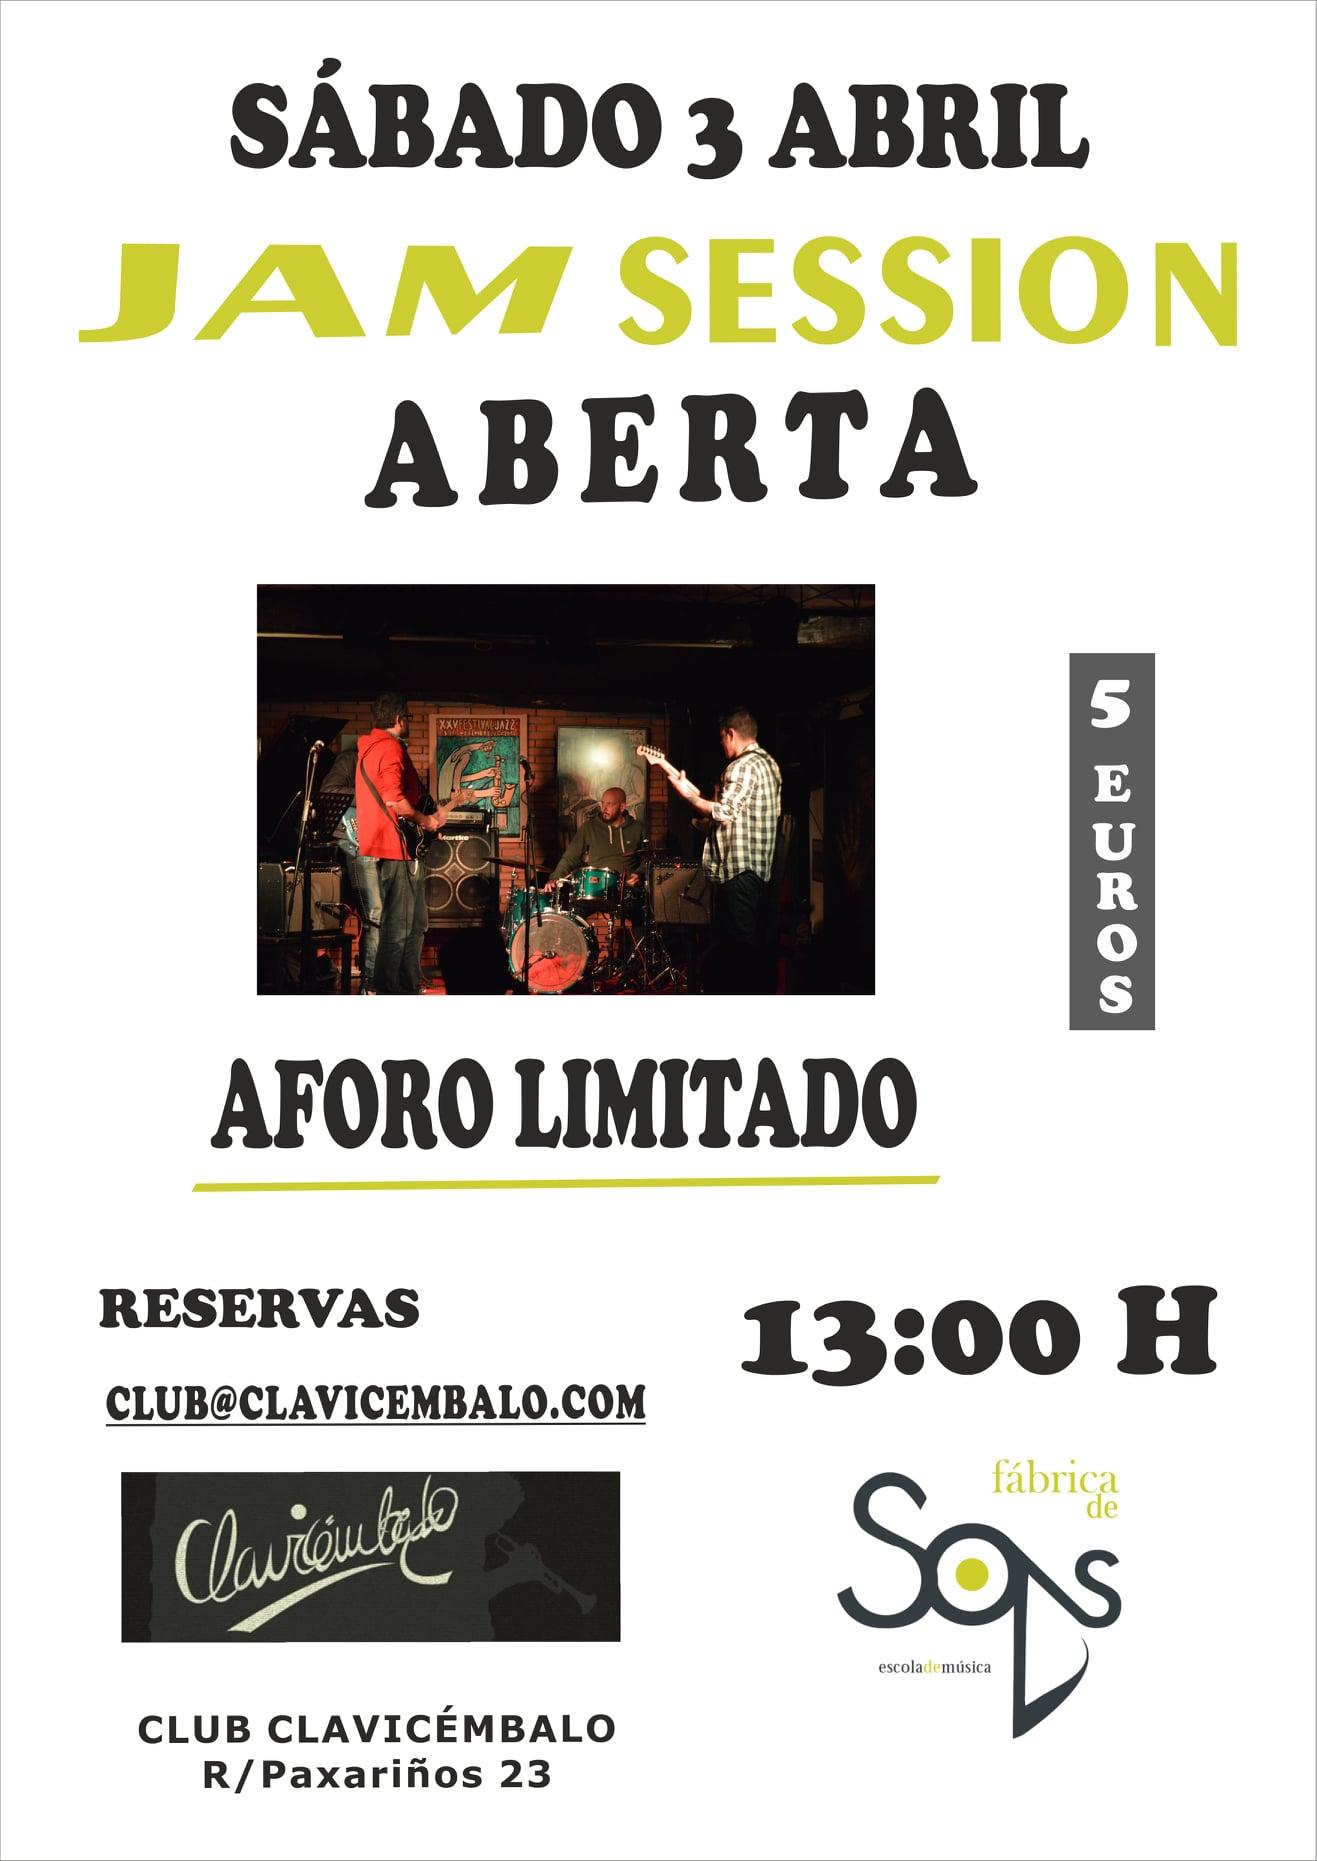 Club Clavicémbalo - Jam Session Aberta